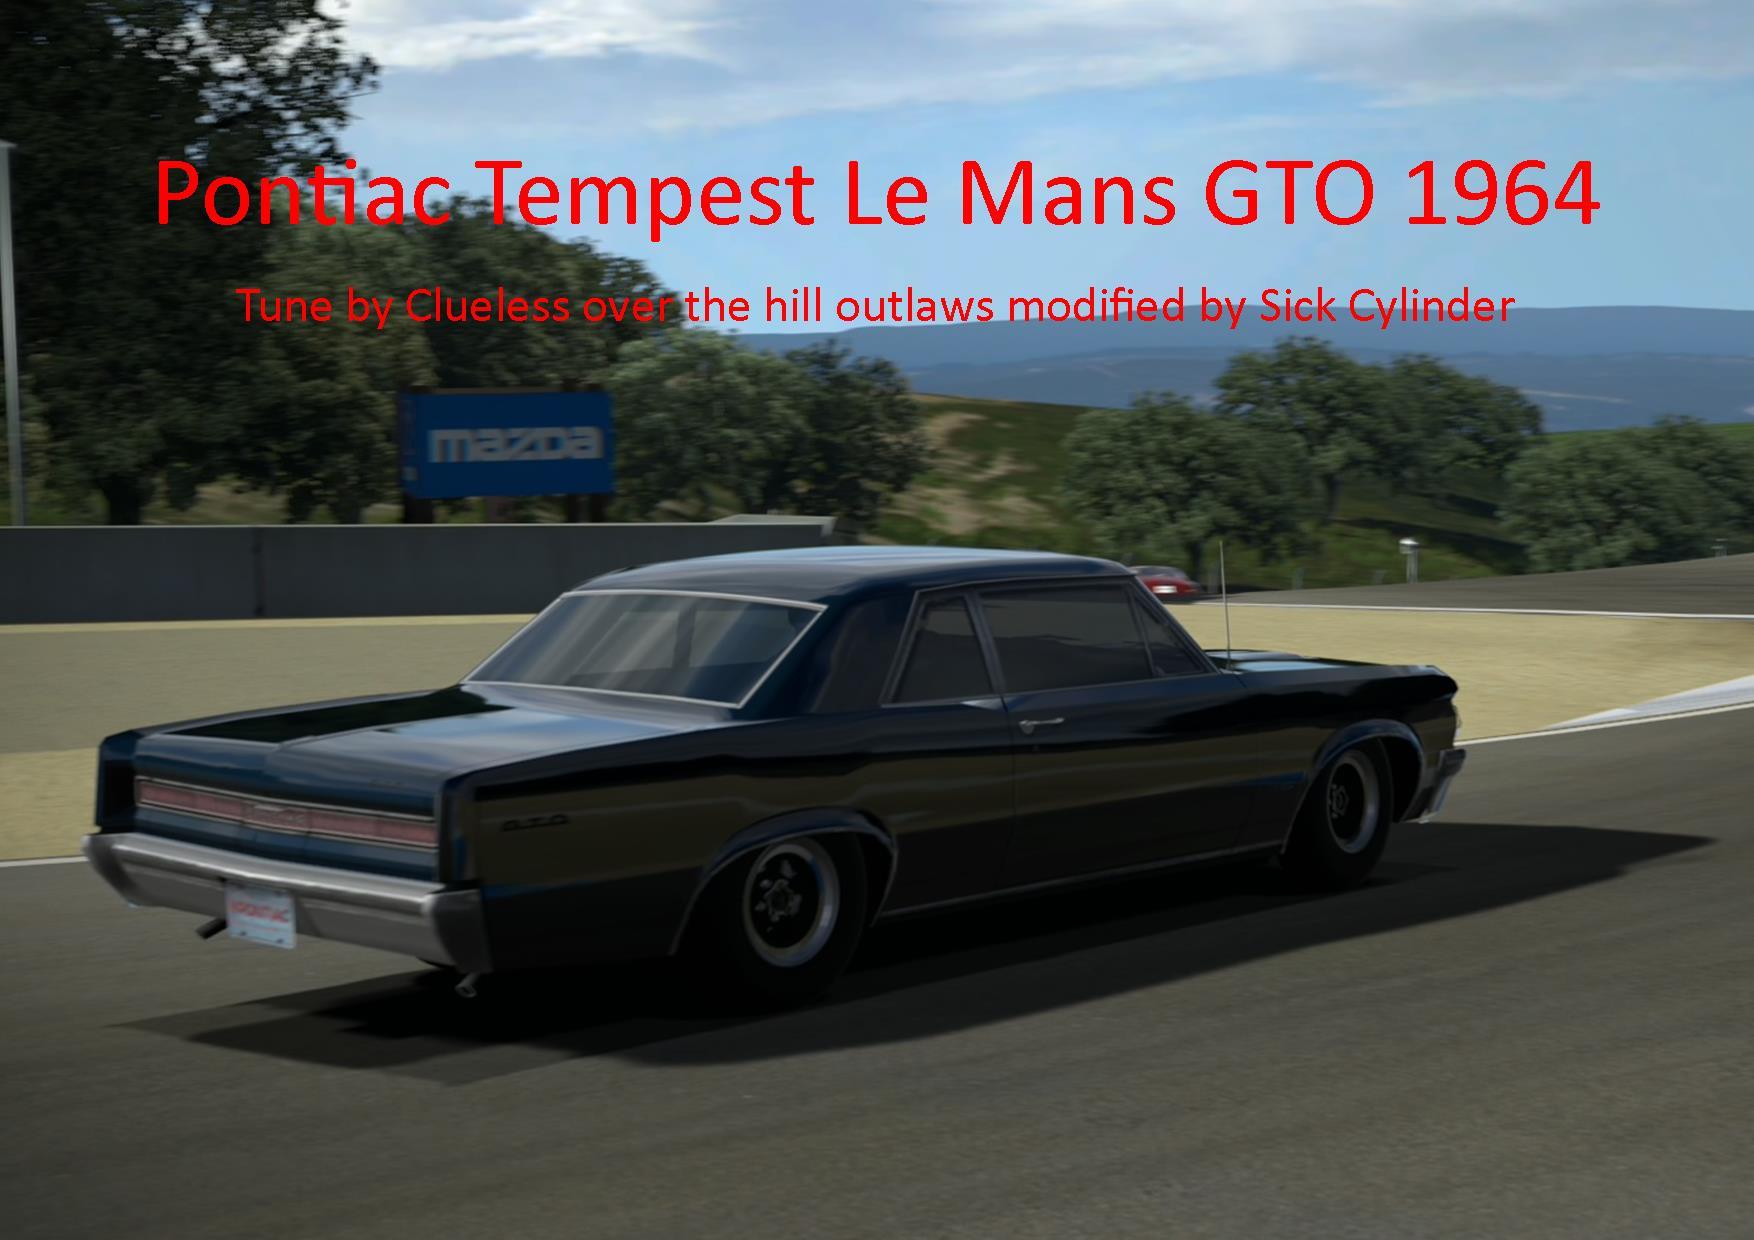 Pontiac Tempest 1964 Tune.jpg